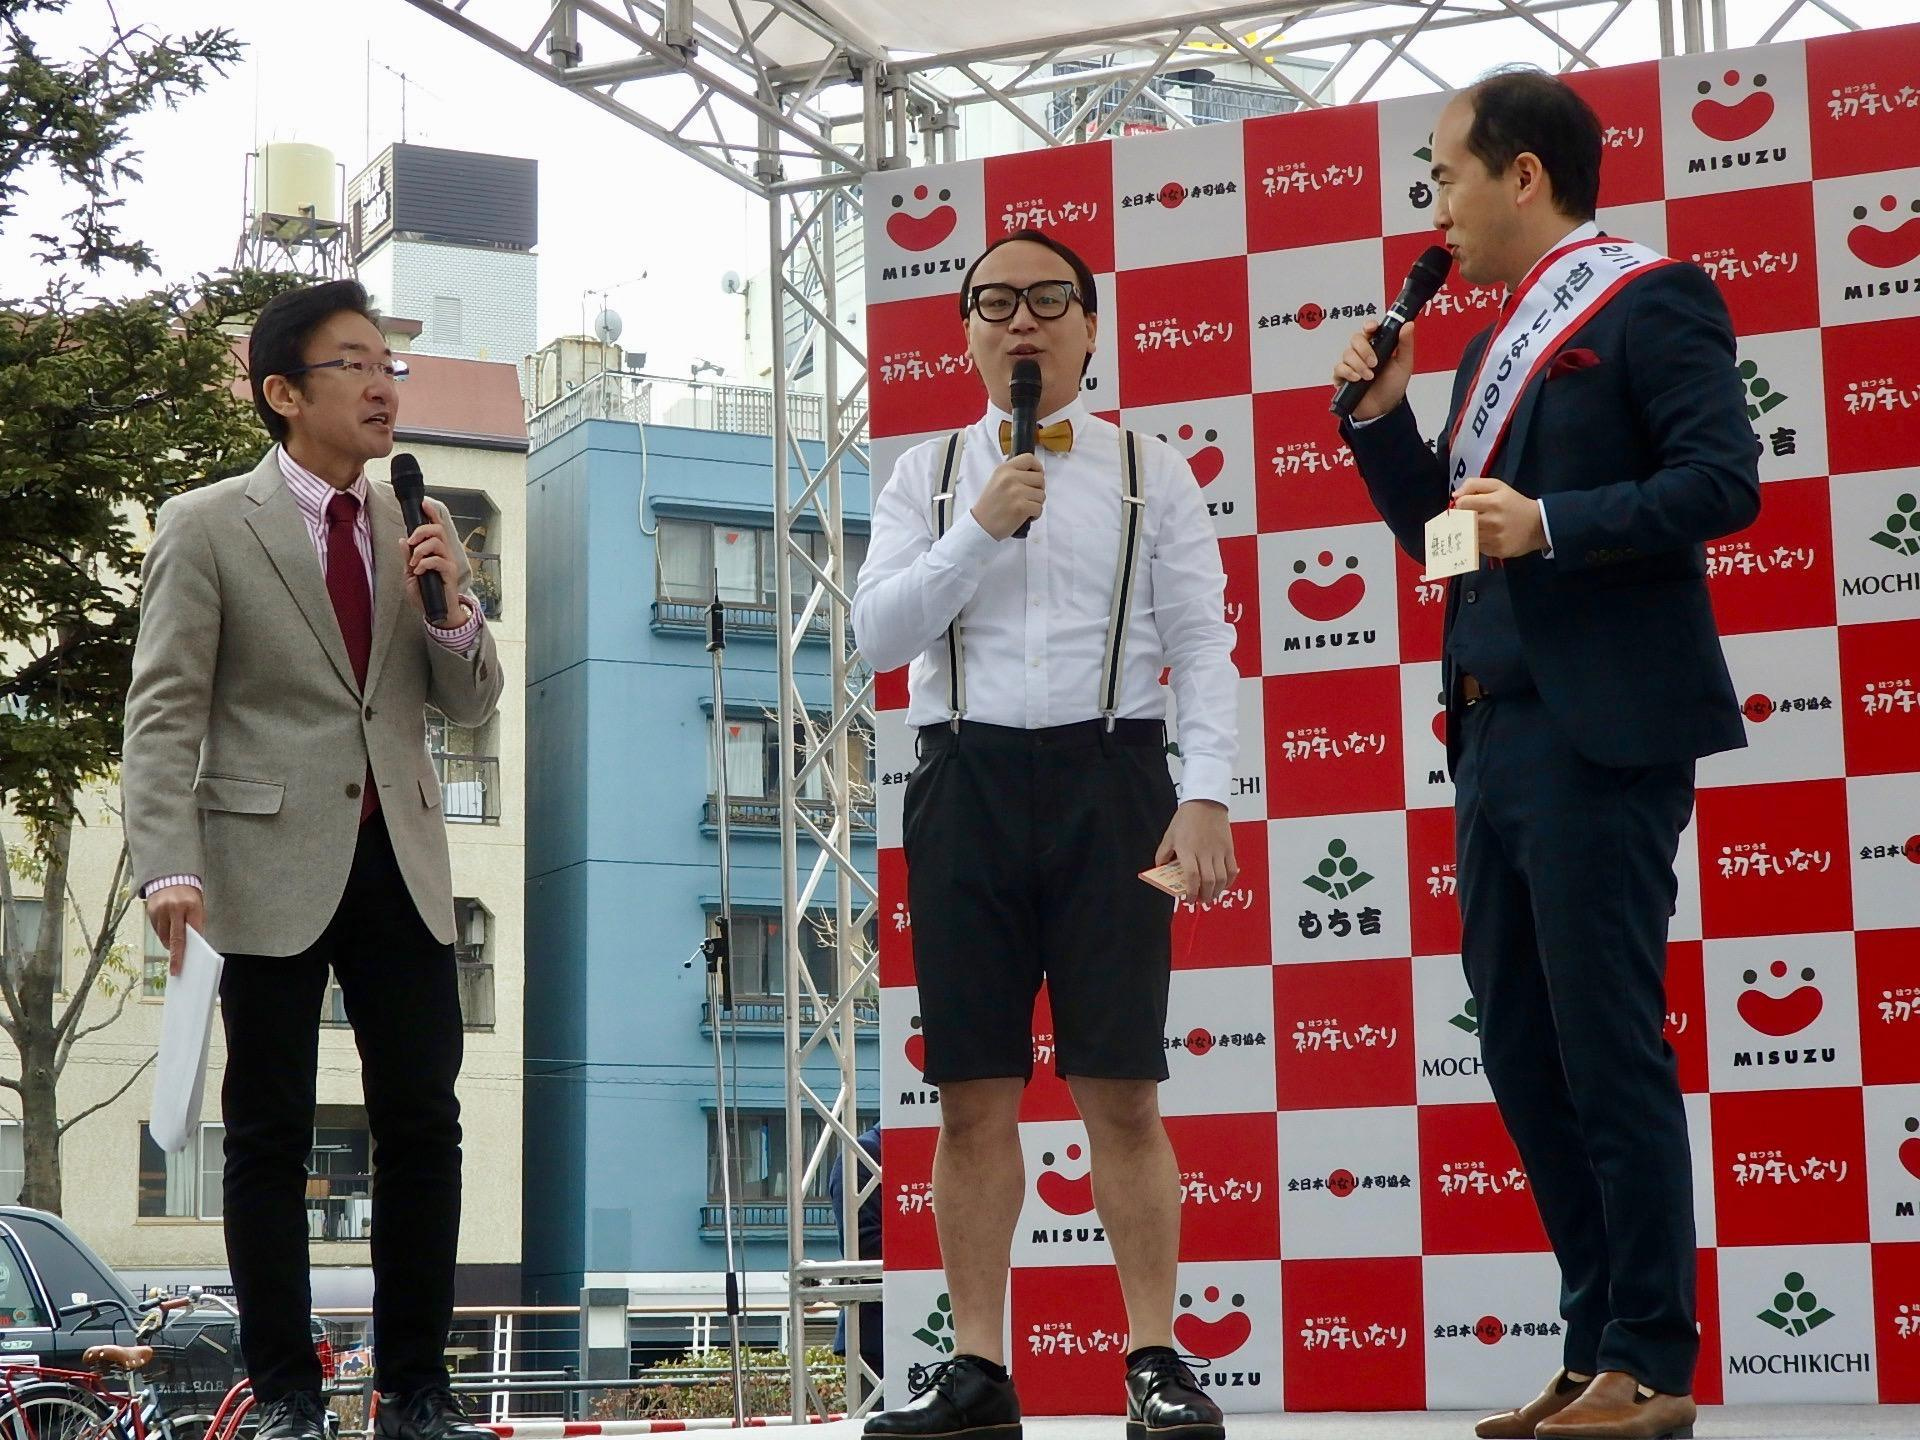 http://news.yoshimoto.co.jp/20180210163738-c72f2670b7148a33cf77827a2290f8984eaaf127.jpg